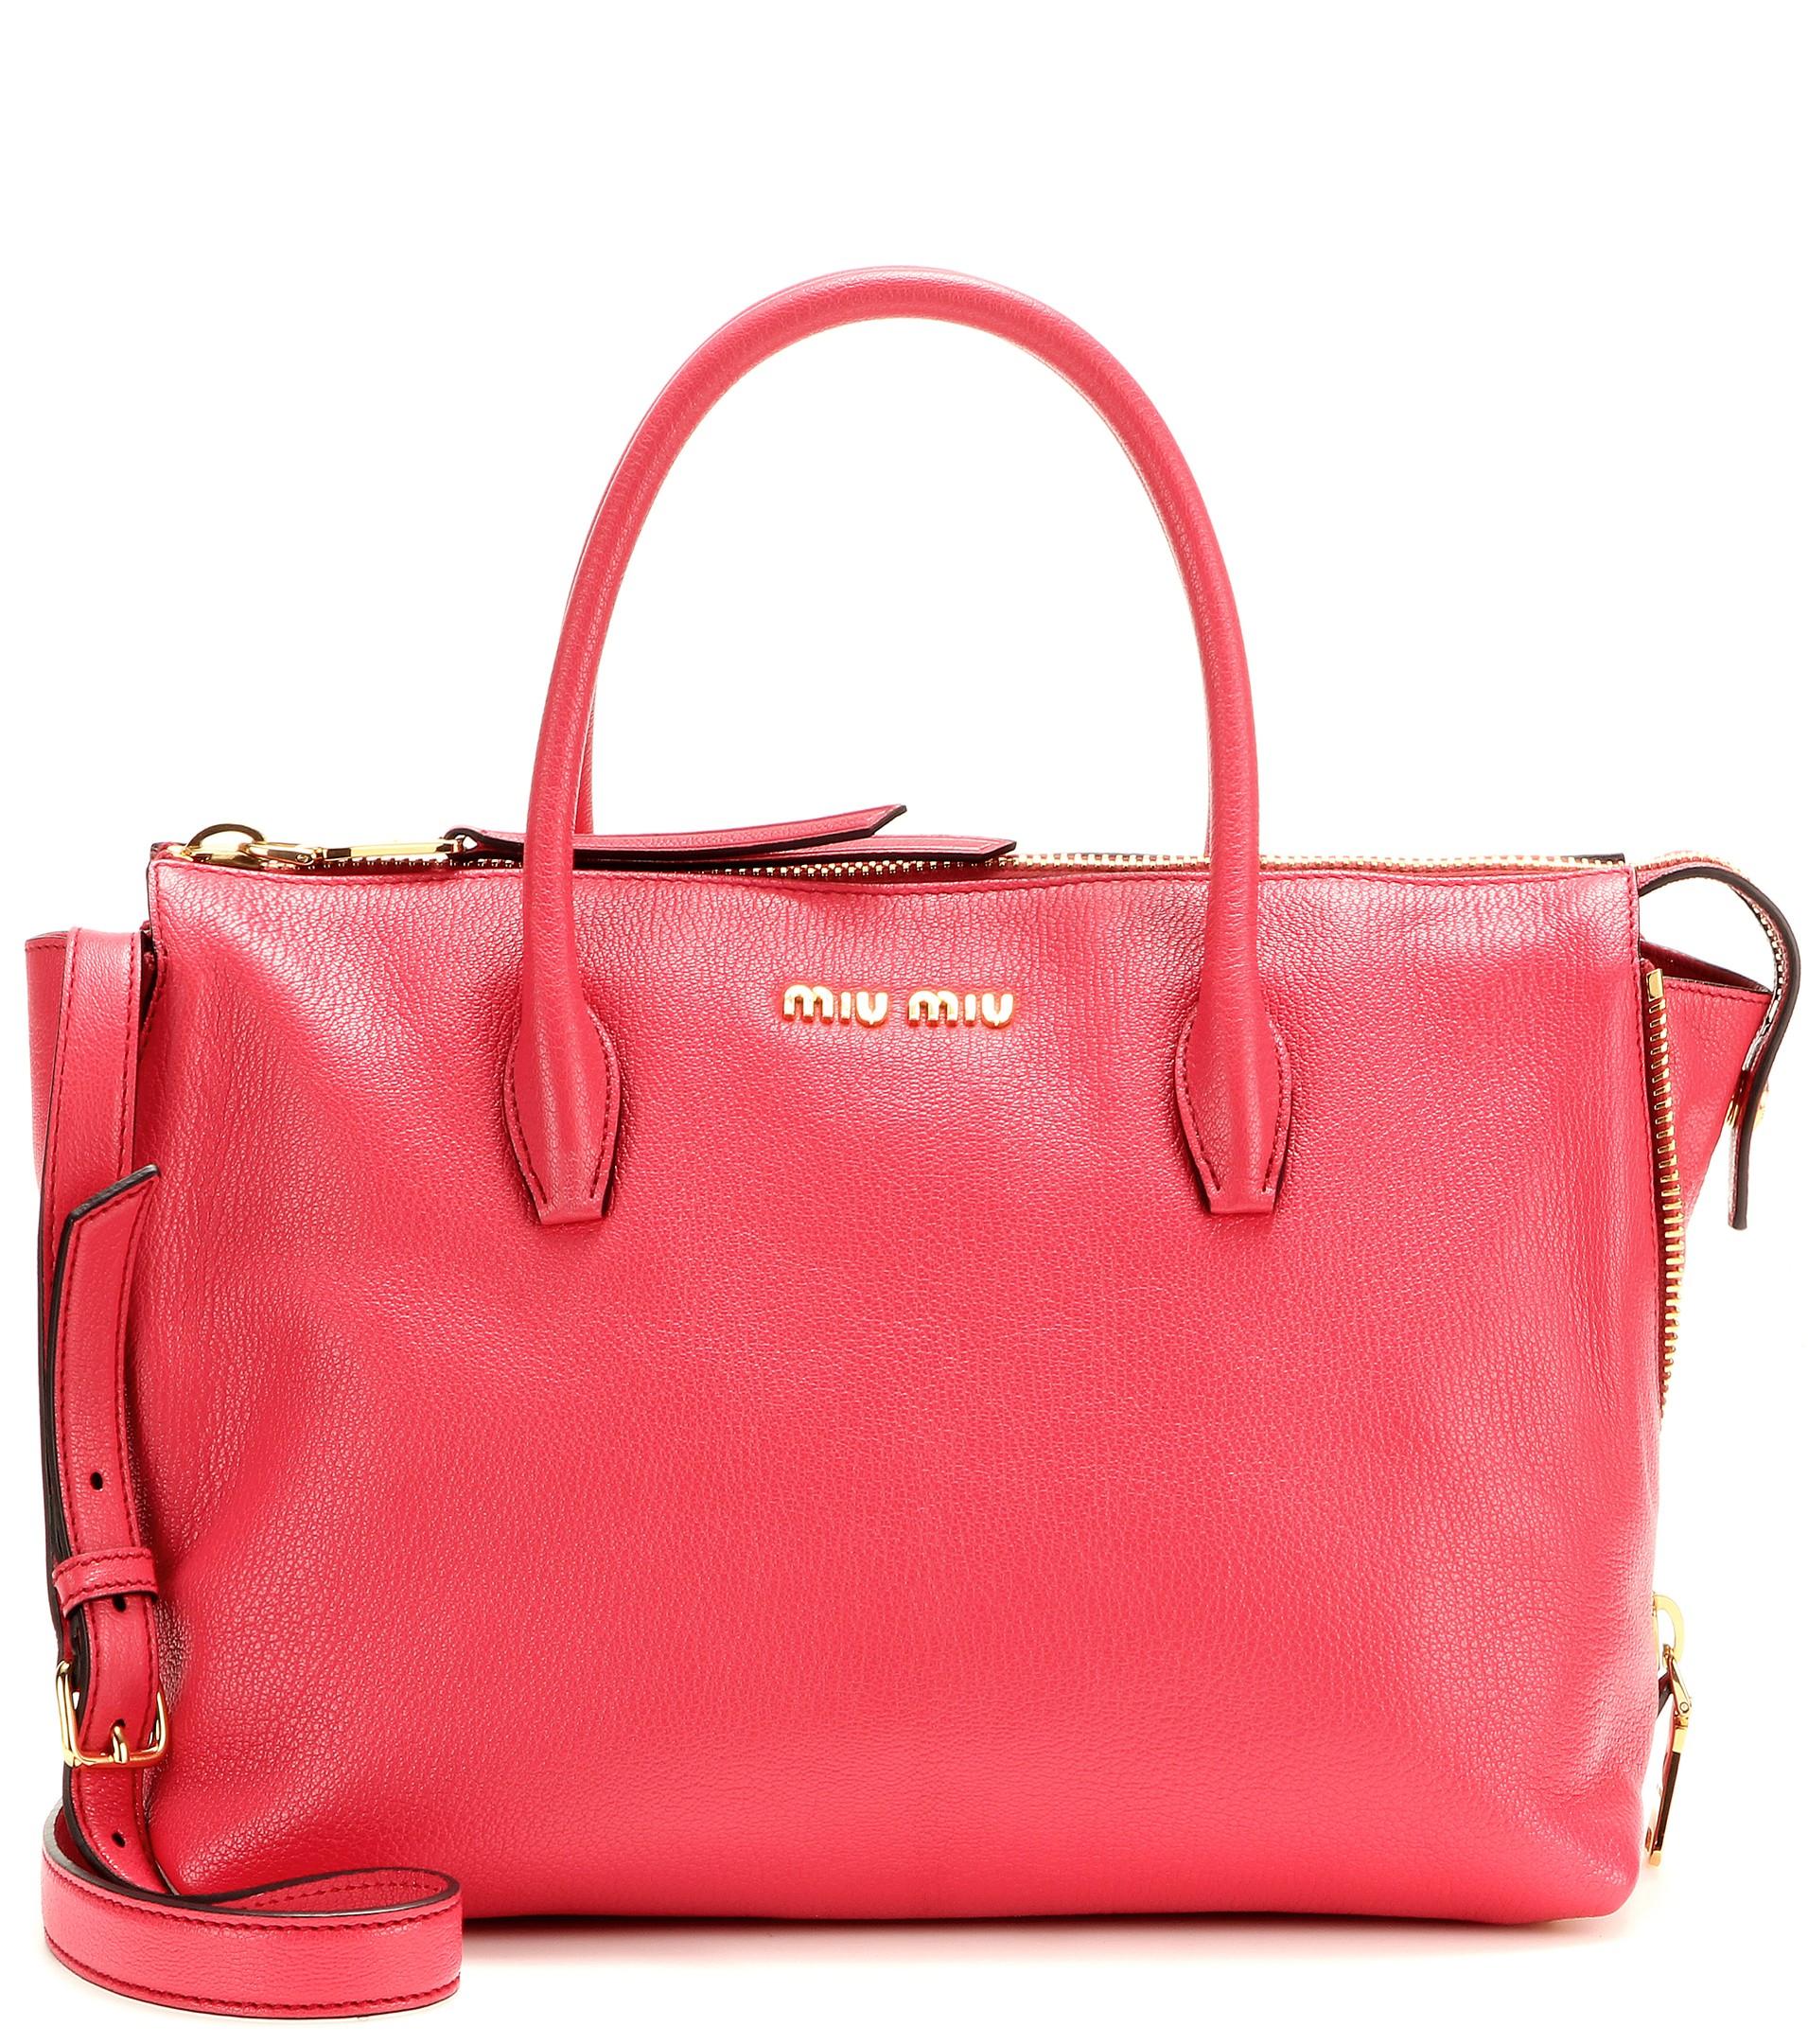 a07853846d26 miu miu outlet hong kong - Miu miu Leather Tote in Pink (Fragola)